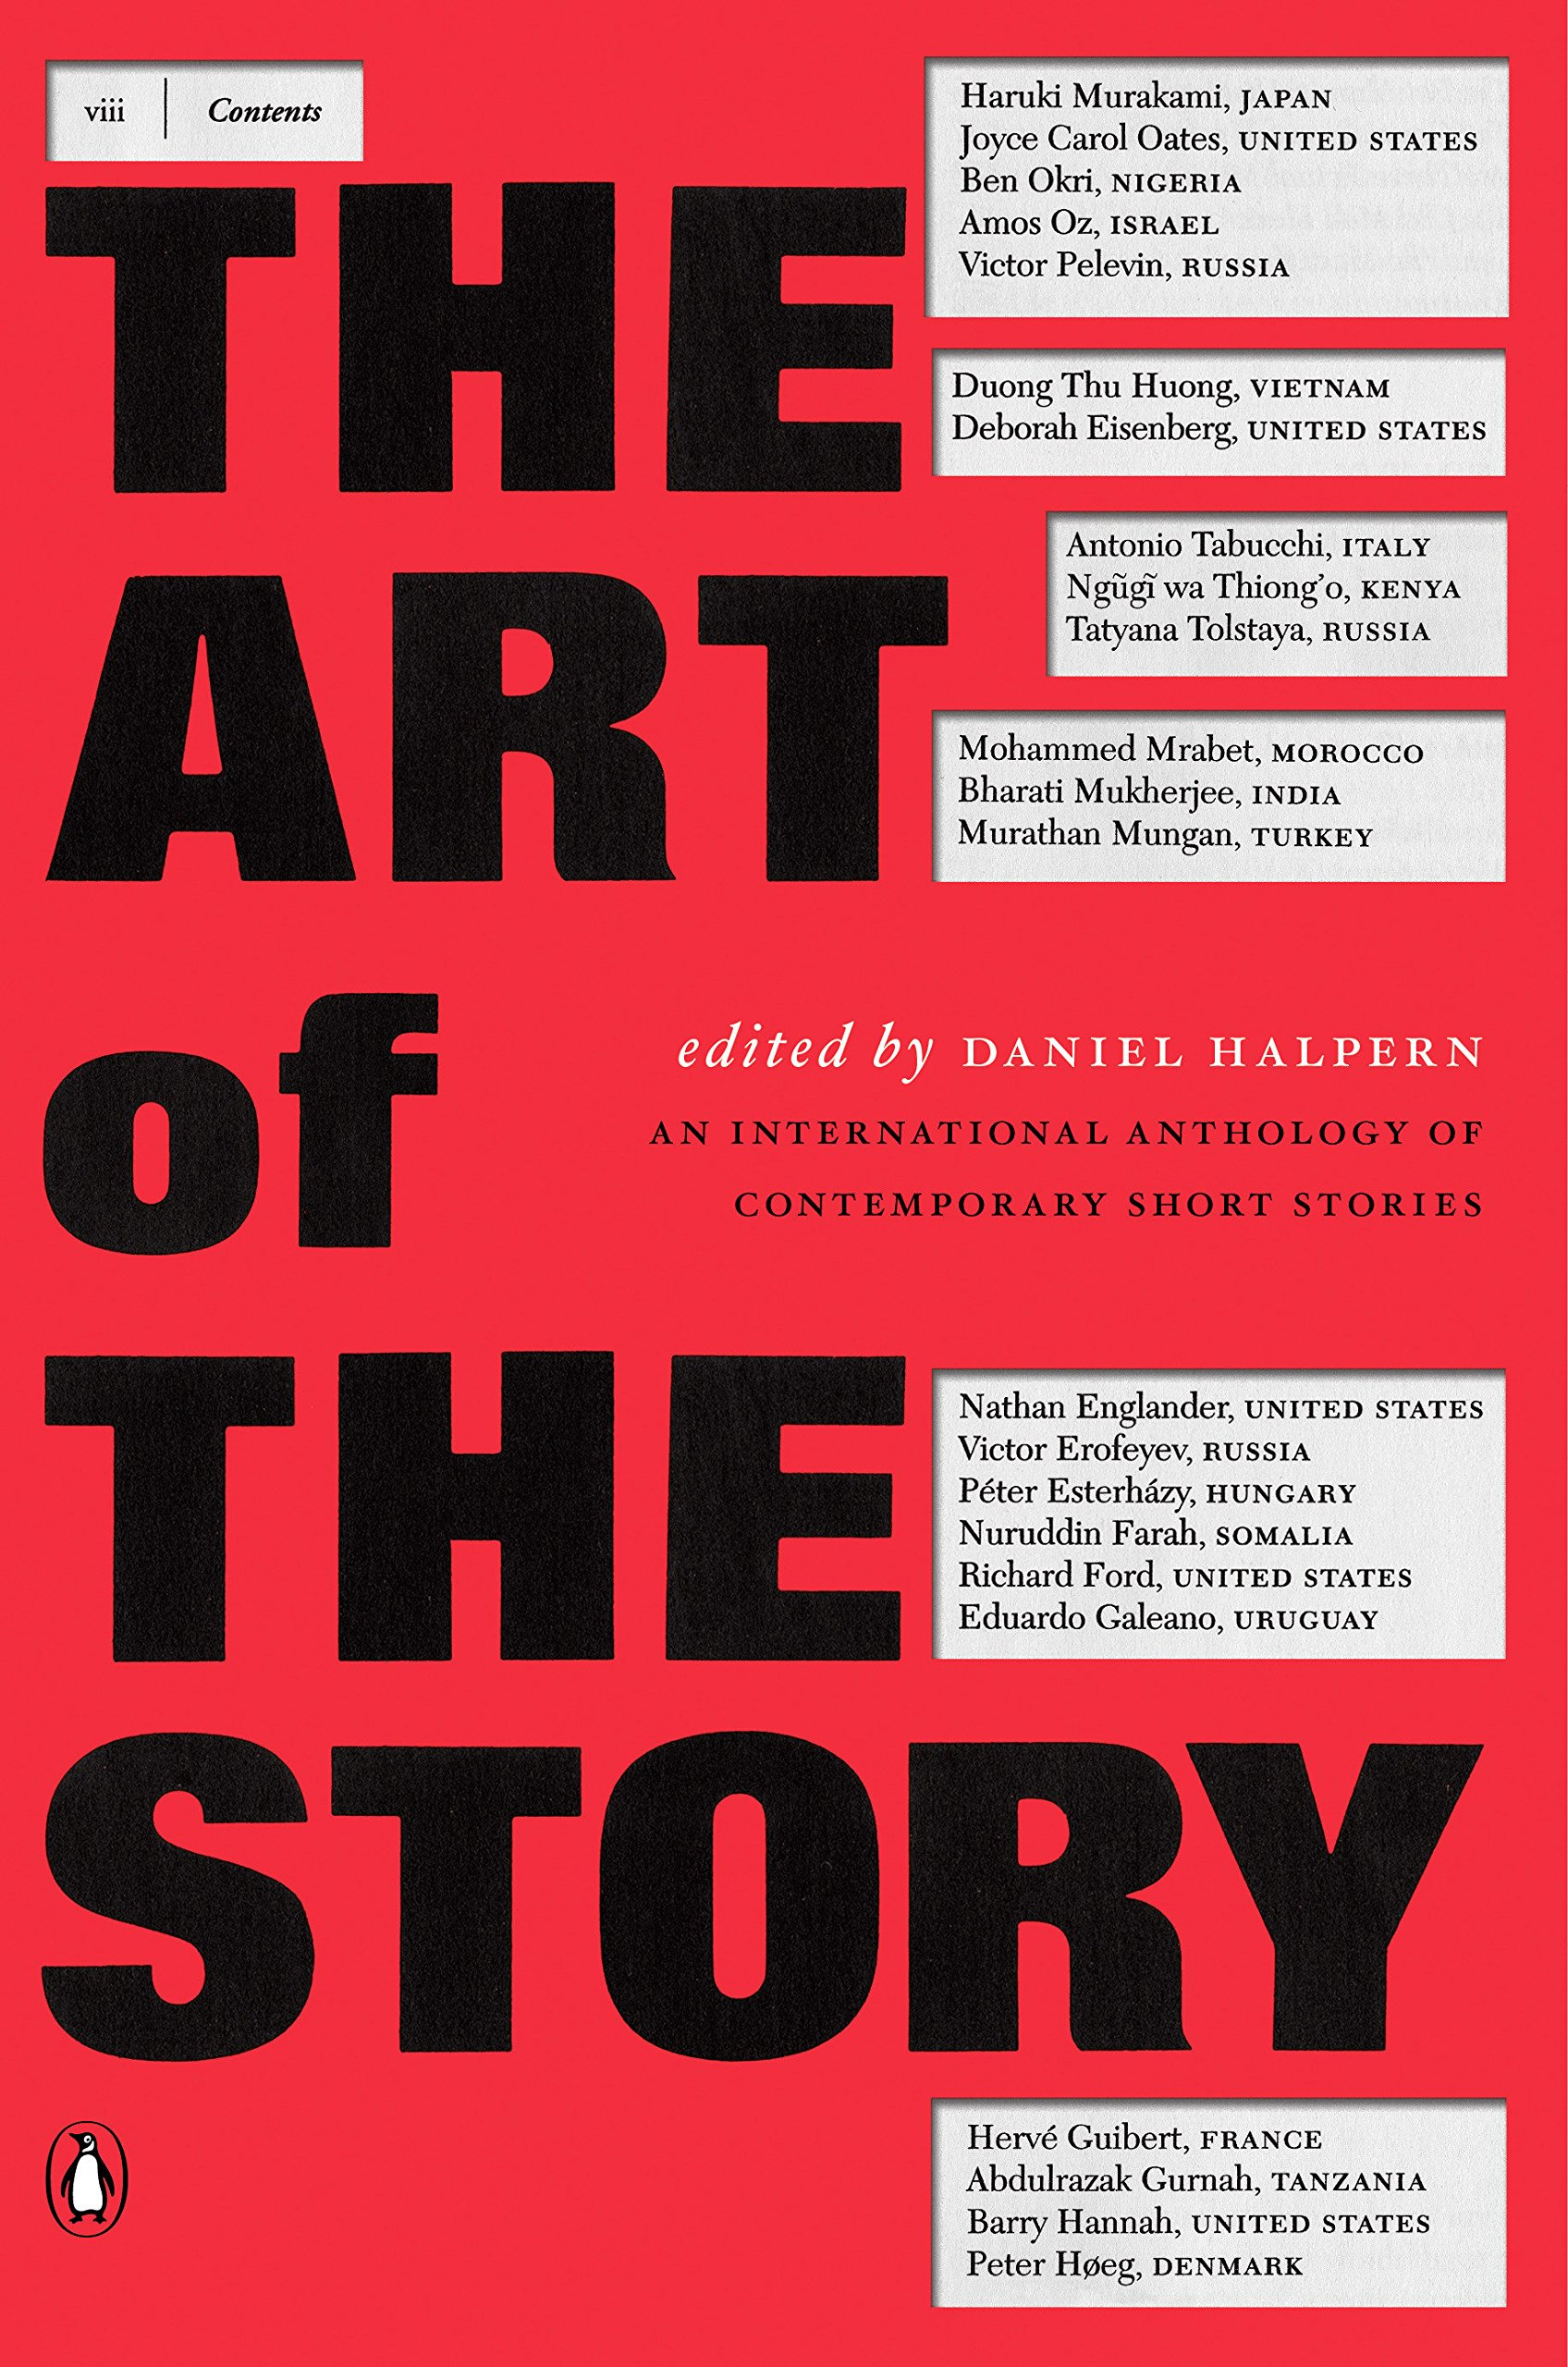 The Art Of Story An International Anthology Contemporary Short Stories Daniel Halpern 9780140296389 Amazon Books